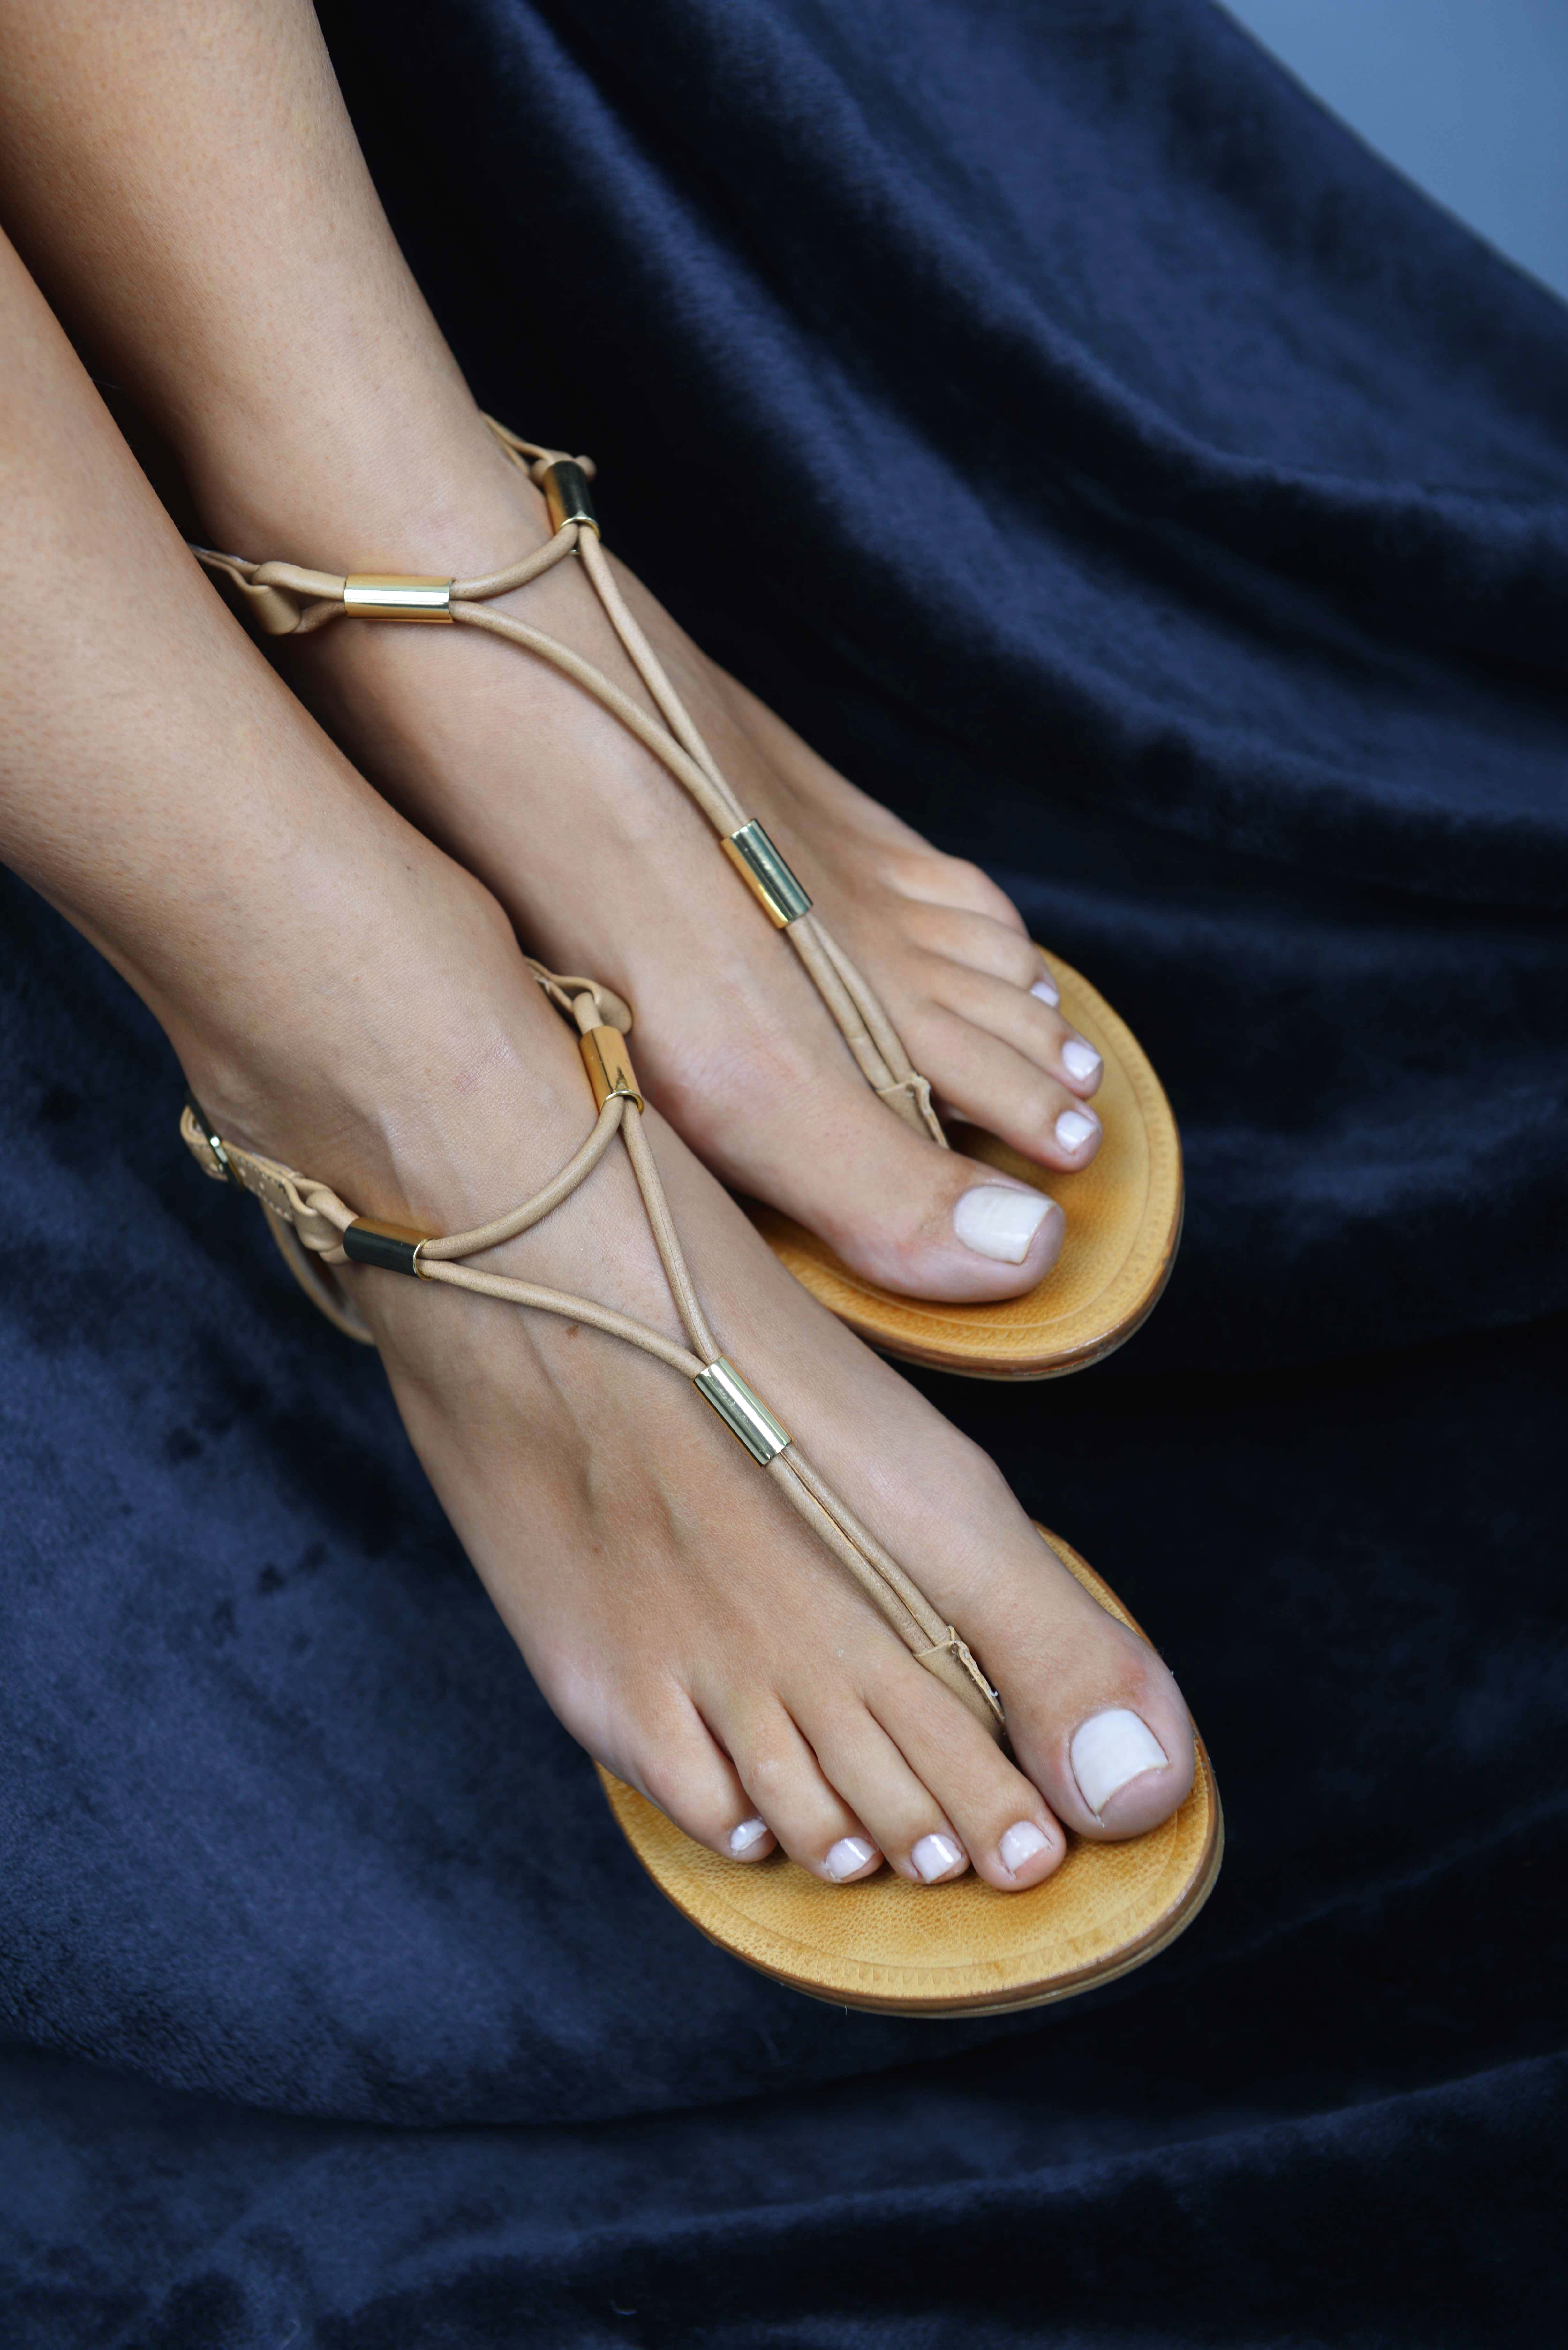 hadas-nuriel_feet2